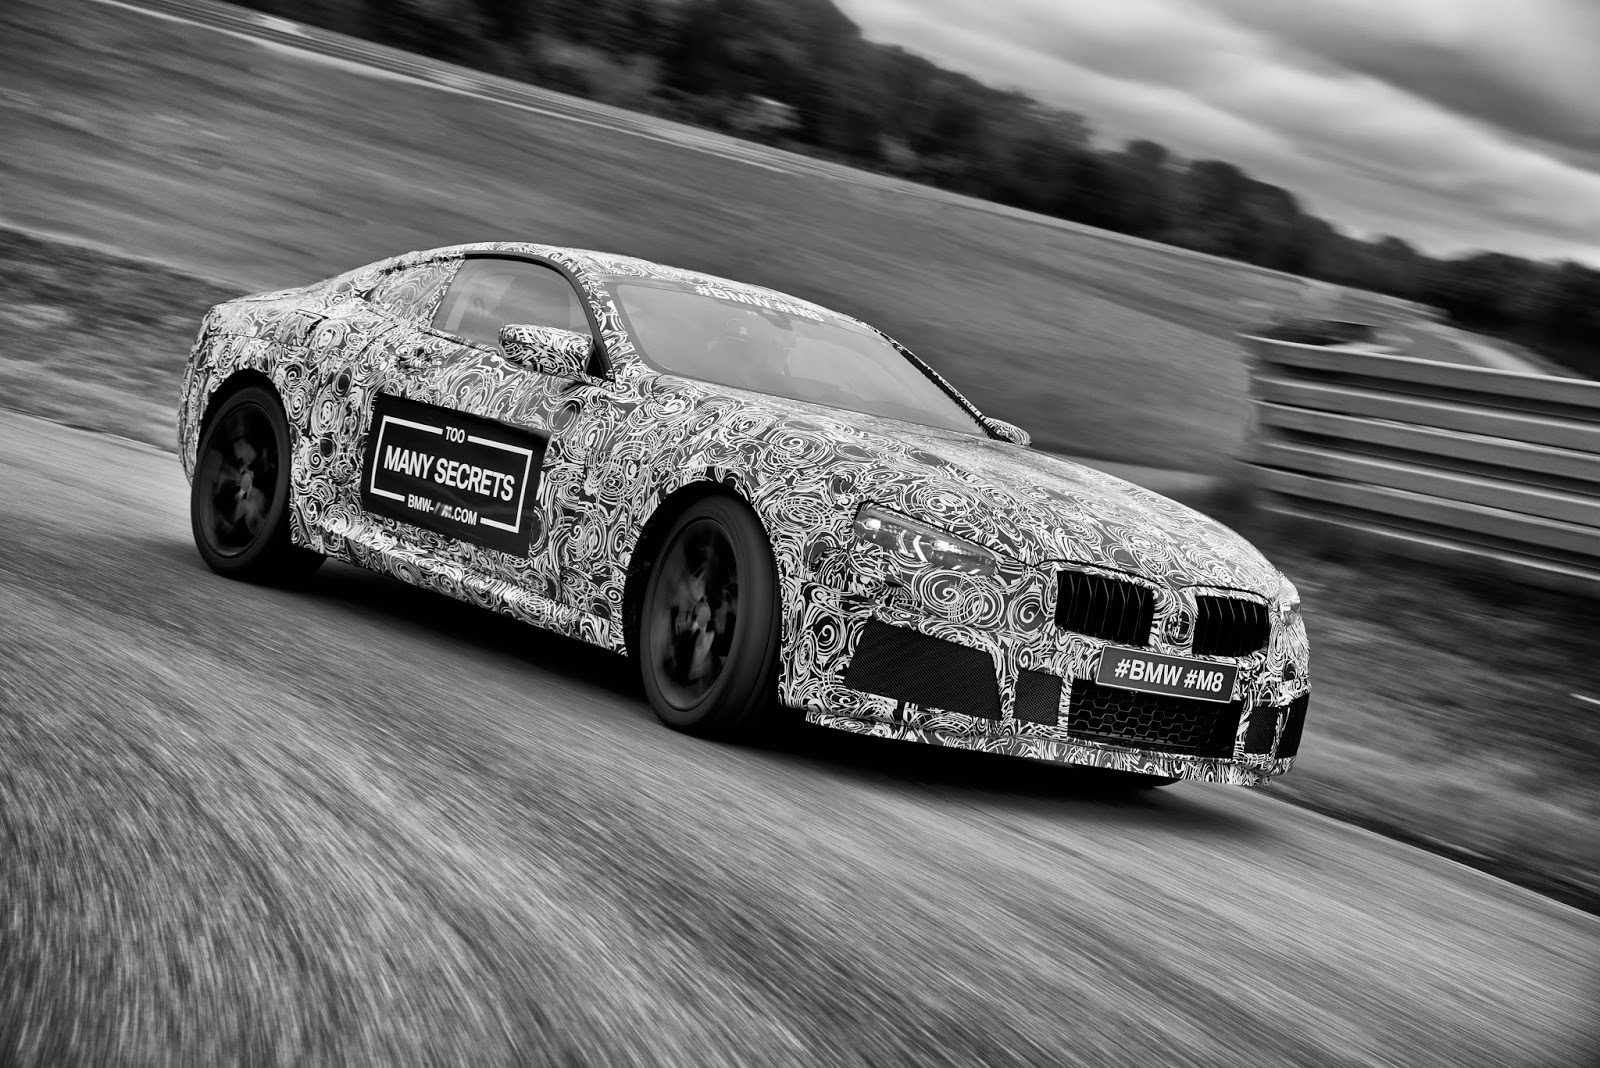 P90260936 highRes bmw m8 prototype 05 1 1 H ναυαρχίδα της BMW, η M8 θα είναι οκτακύλινδρη BMW, BMW Concept, BMW Concept 8 Series, BMW M, BMW M Performance, BMW M8